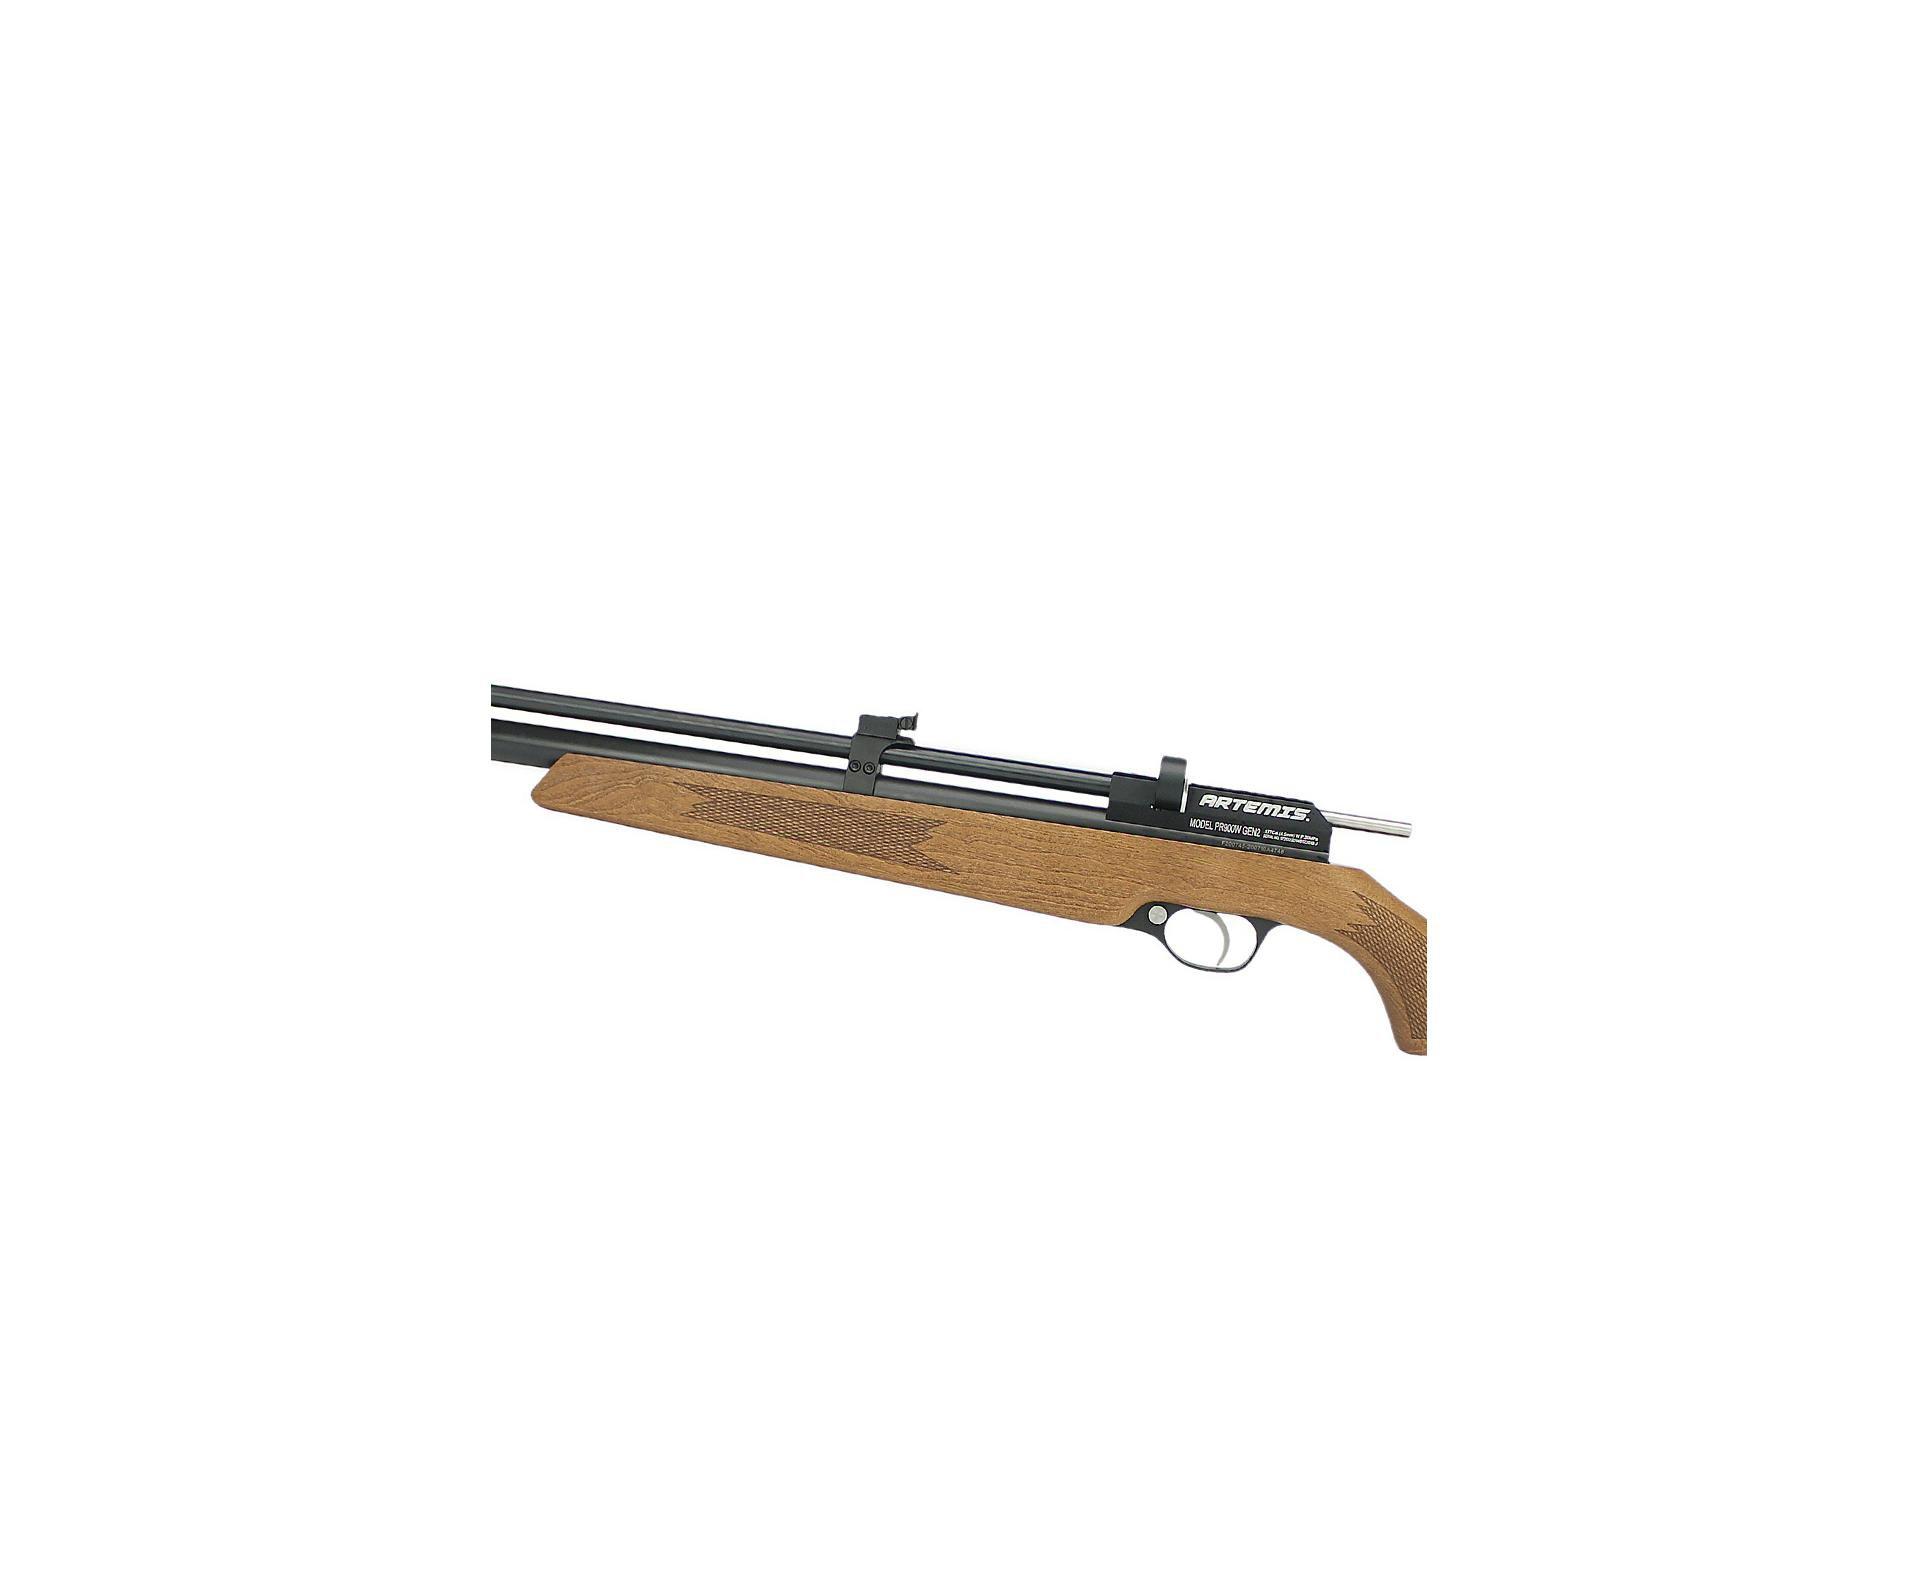 Carabina De Pressão Pcp Pr900w G2 5,5mm New Generation Artemis